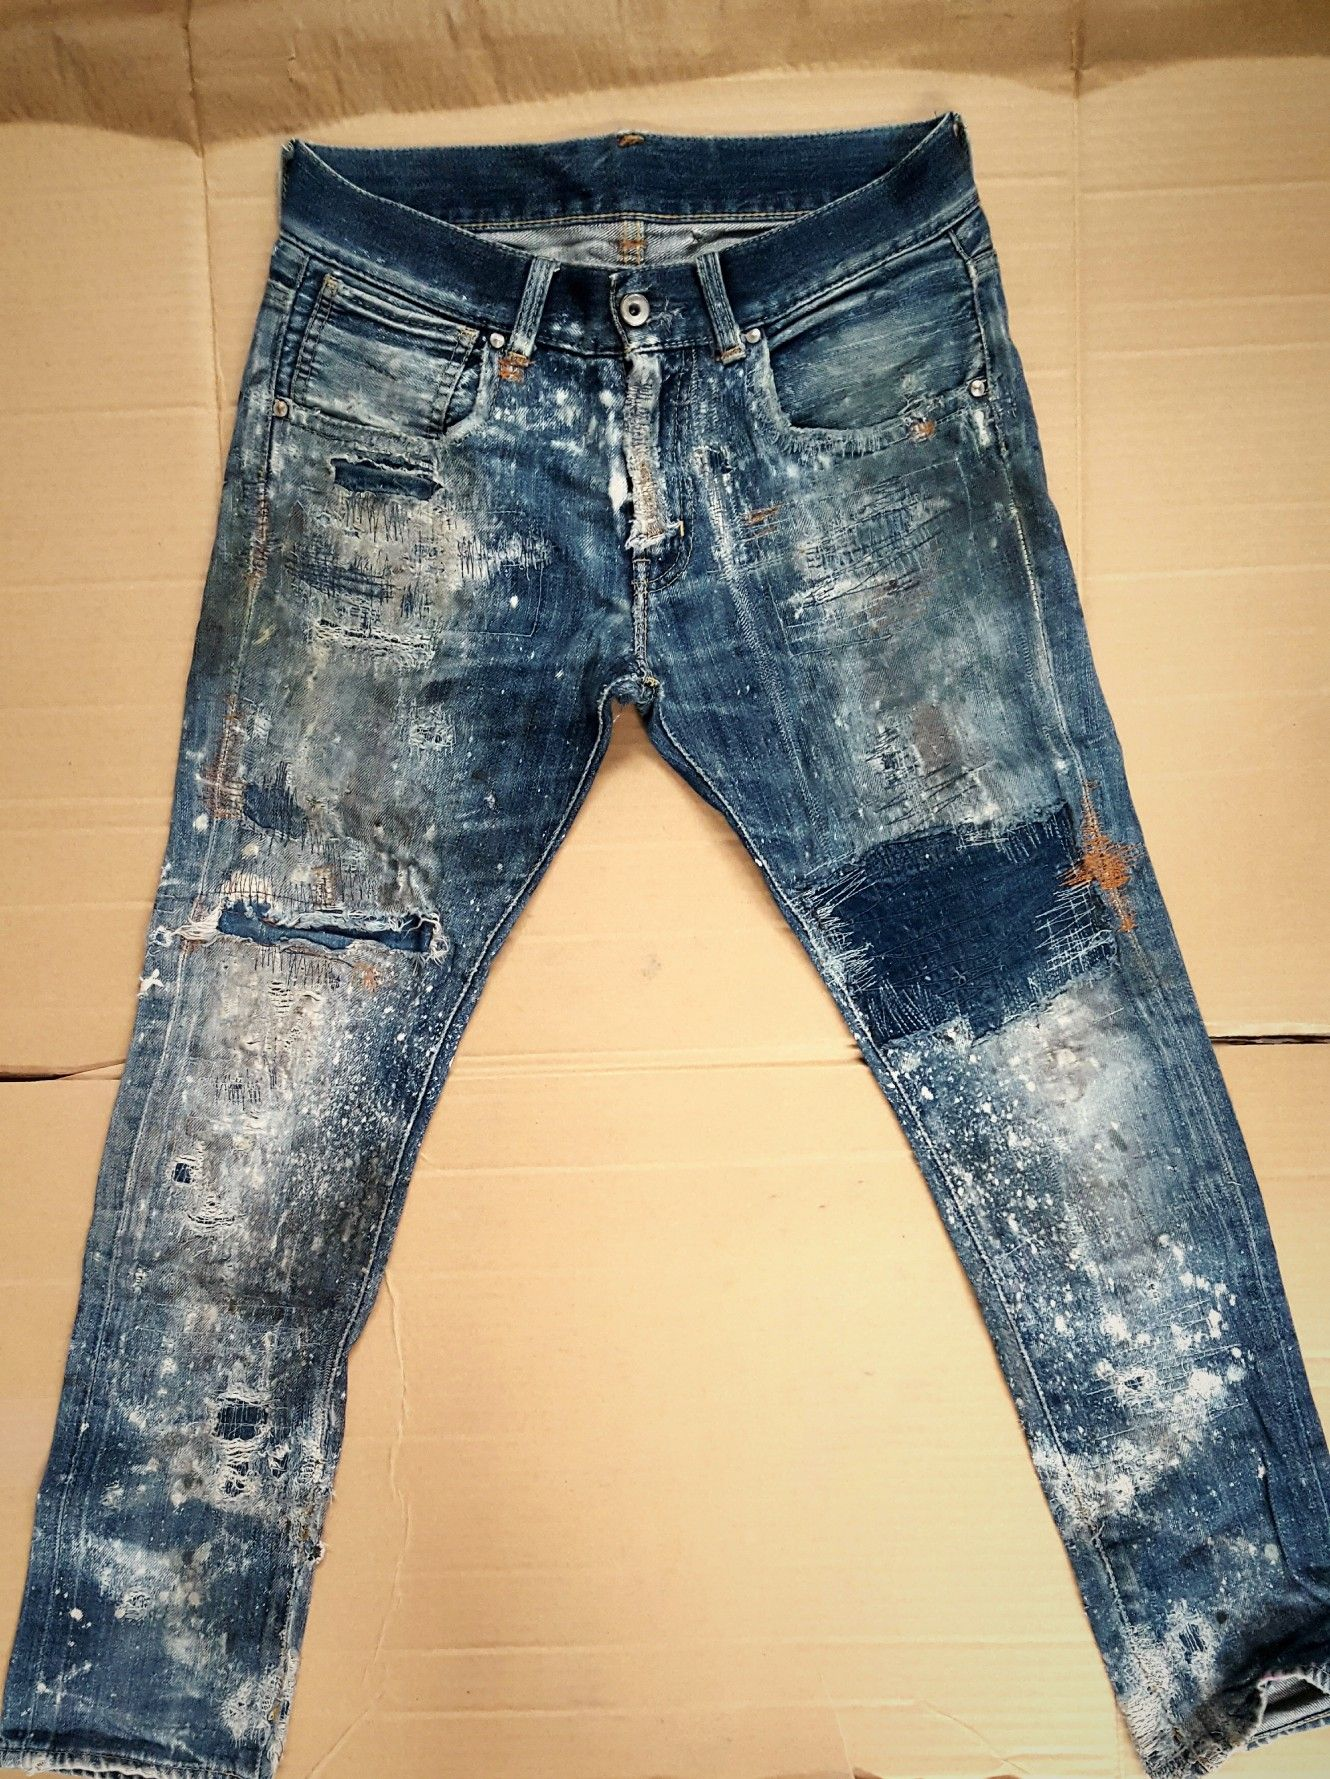 BYWX-Men Workwear Ripped Hole Jeans Destroy Slim Fit Short